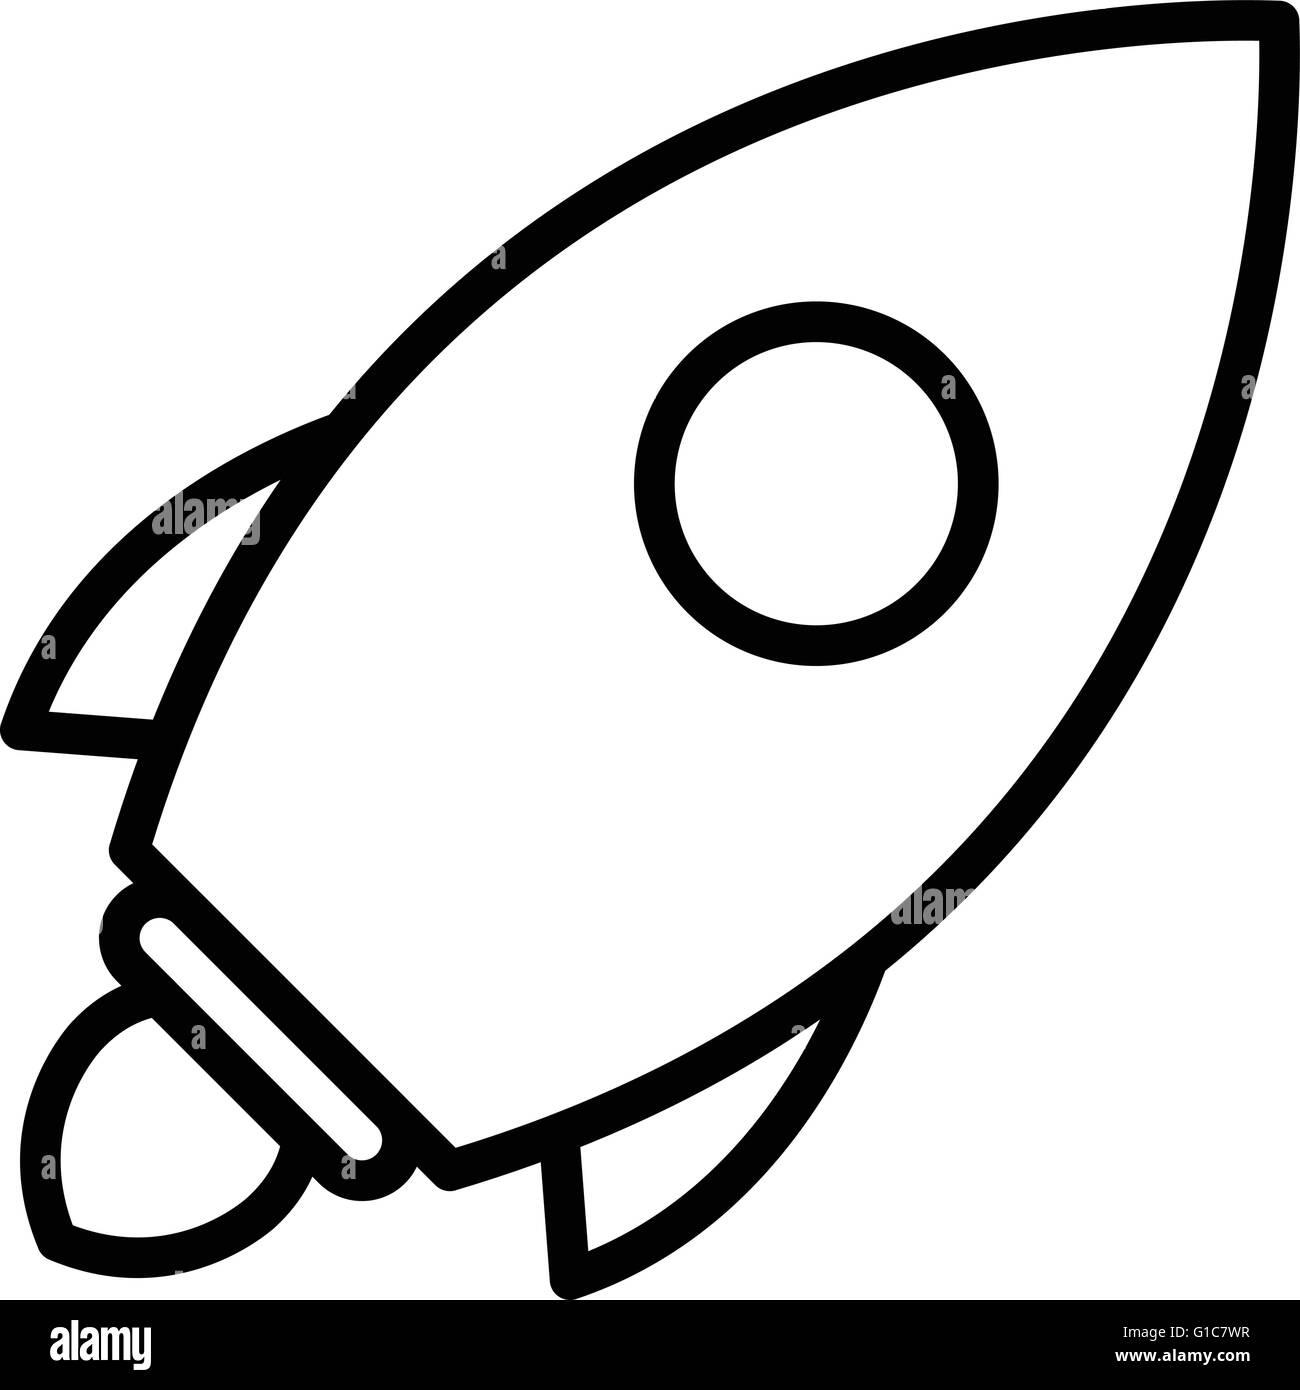 Rocket - Stock Vector